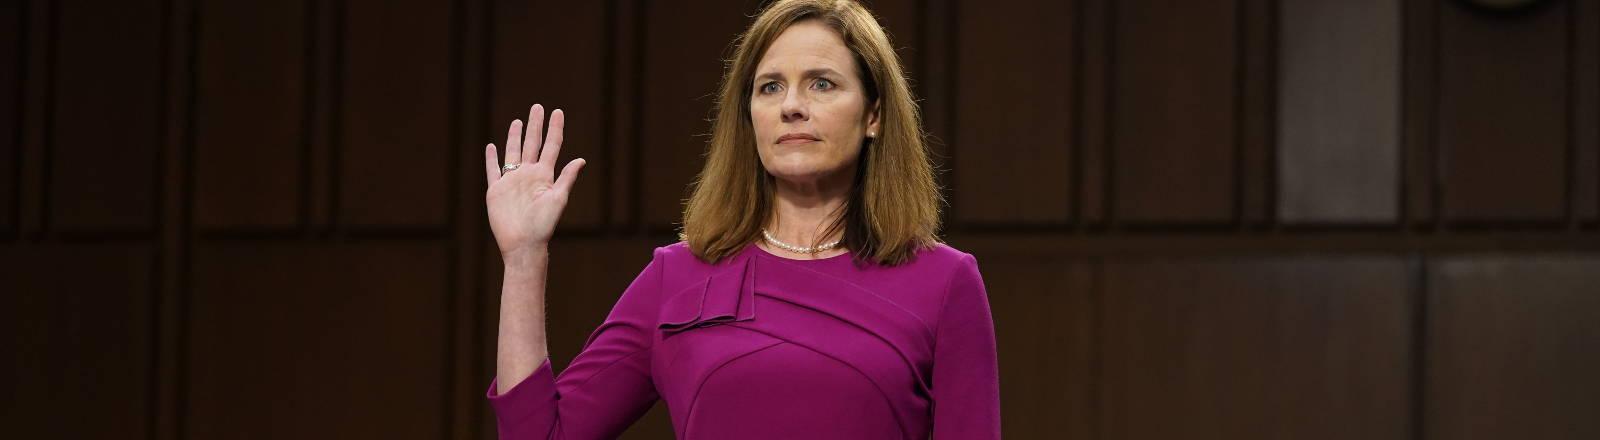 Bundesrichterin Amy Coney Barrett